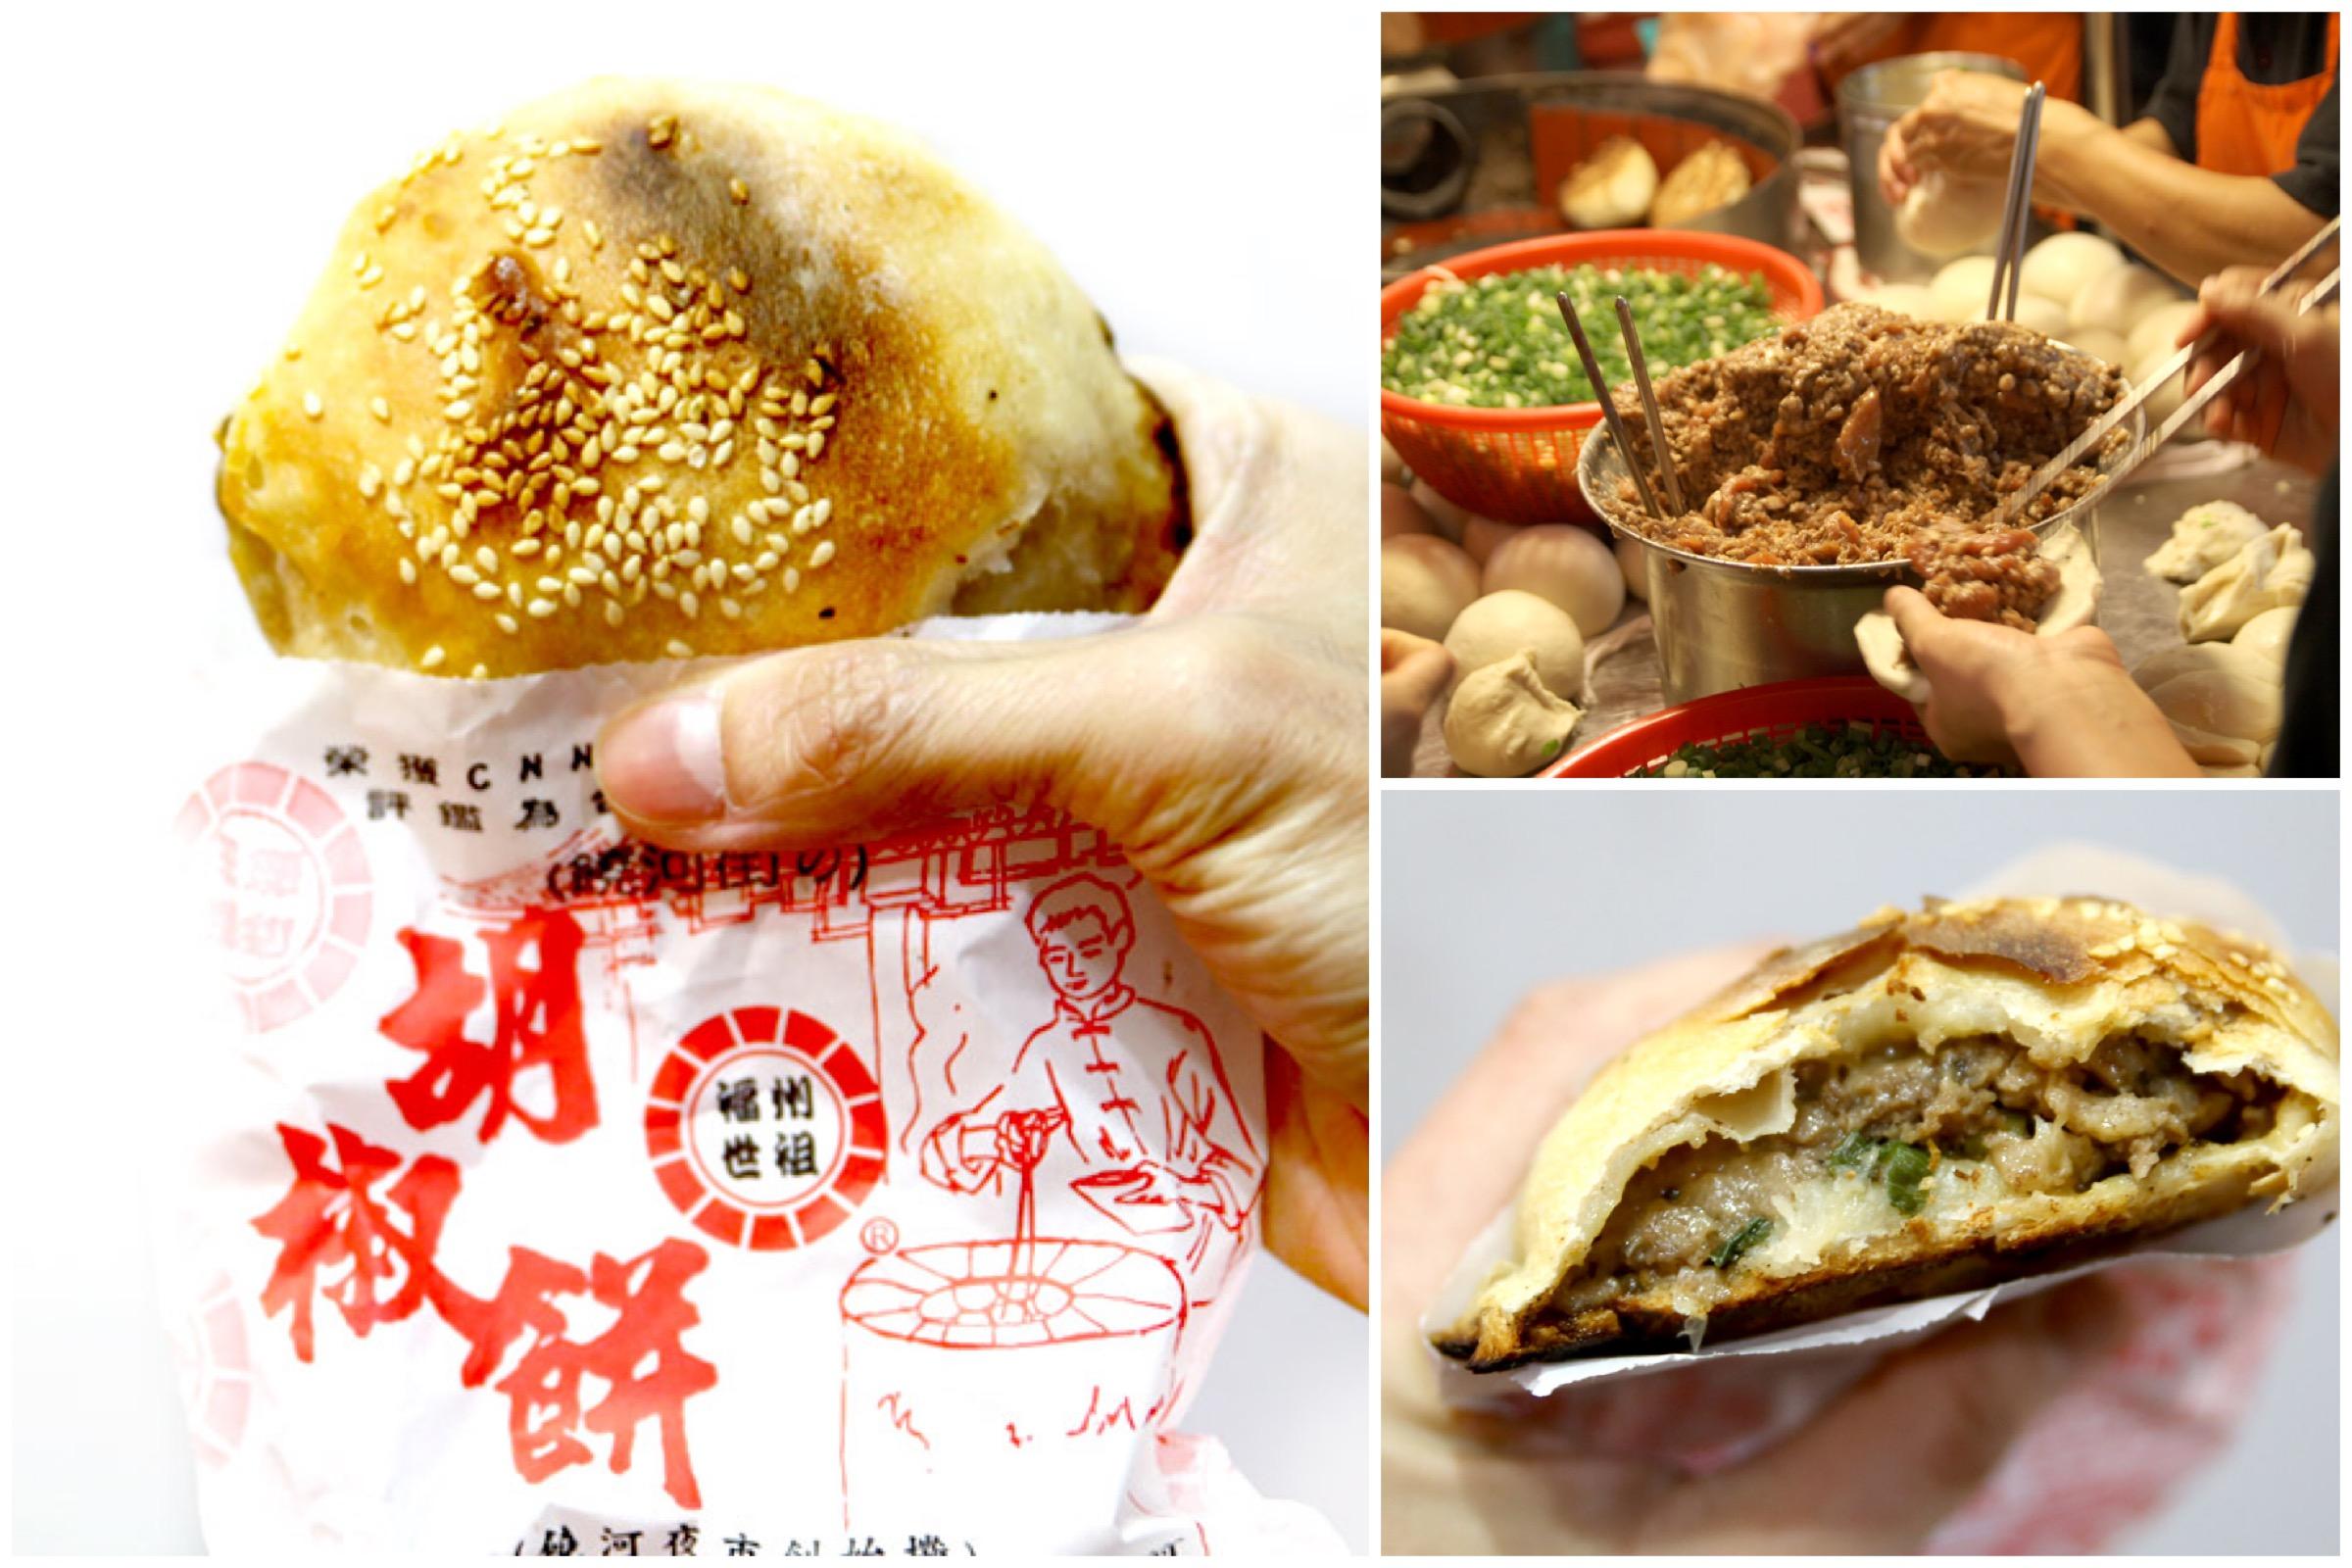 Fu Zhou Shi Zu Pepper Bun 福州世祖胡椒饼 – Most Popular Food At Taipei's Rao He Night Market. Meaty & Juicy